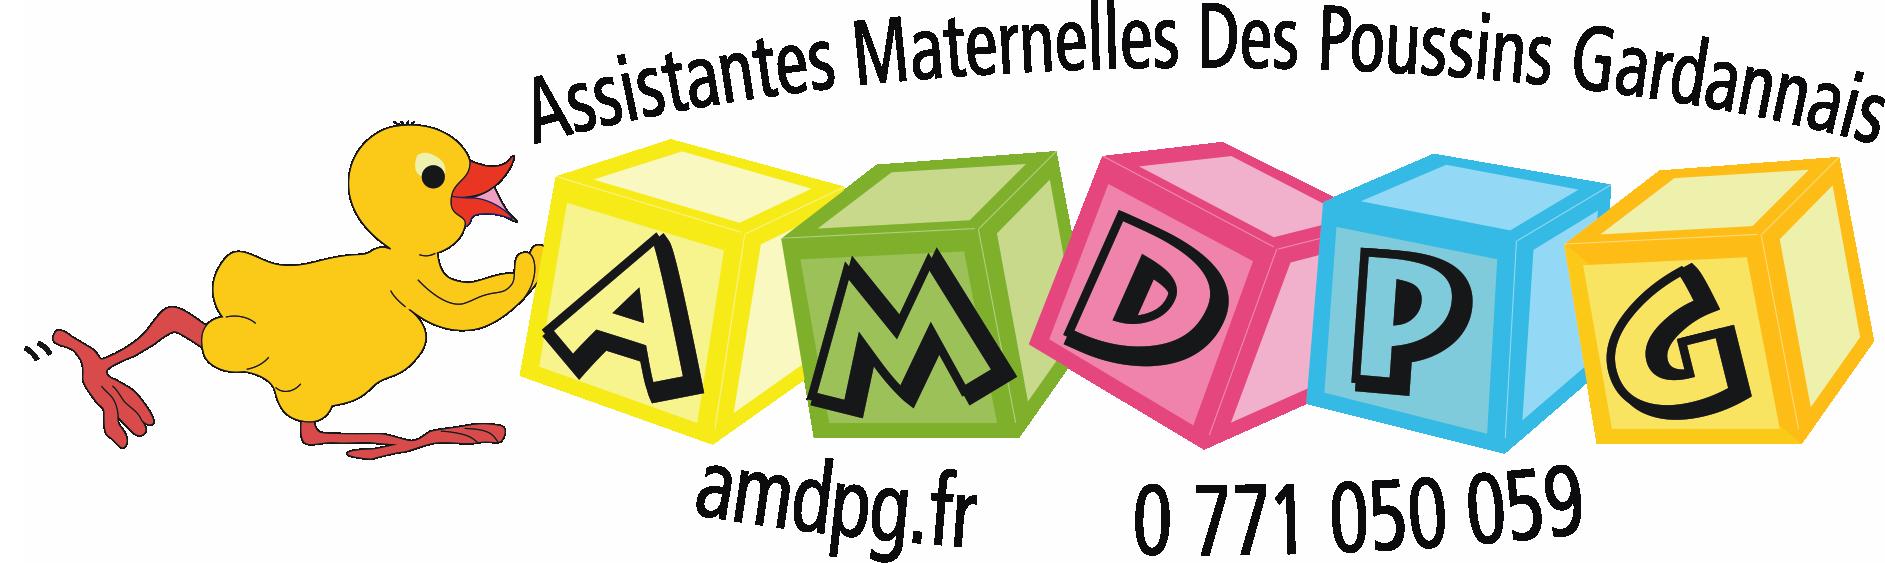 AMDPG